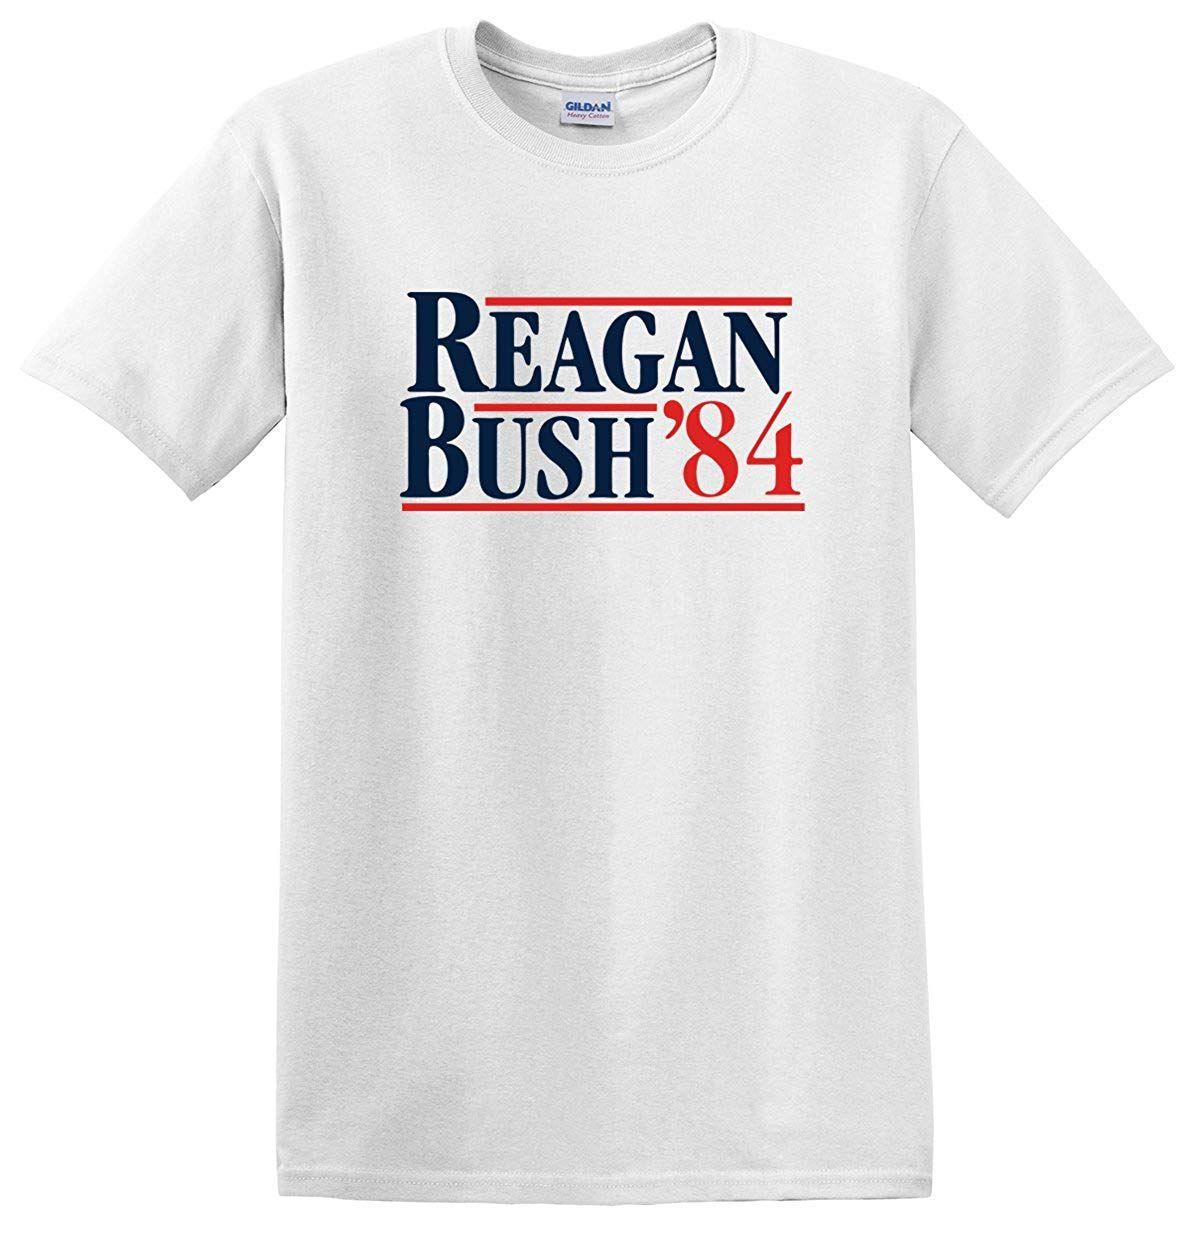 931bdc45 Reagan Bush 84 T Shirt Republican Presidential Election Campaign GOP T Shirt  Designer T Shirt Coolest T Shirts From Dhkelinton, $11.17| DHgate.Com